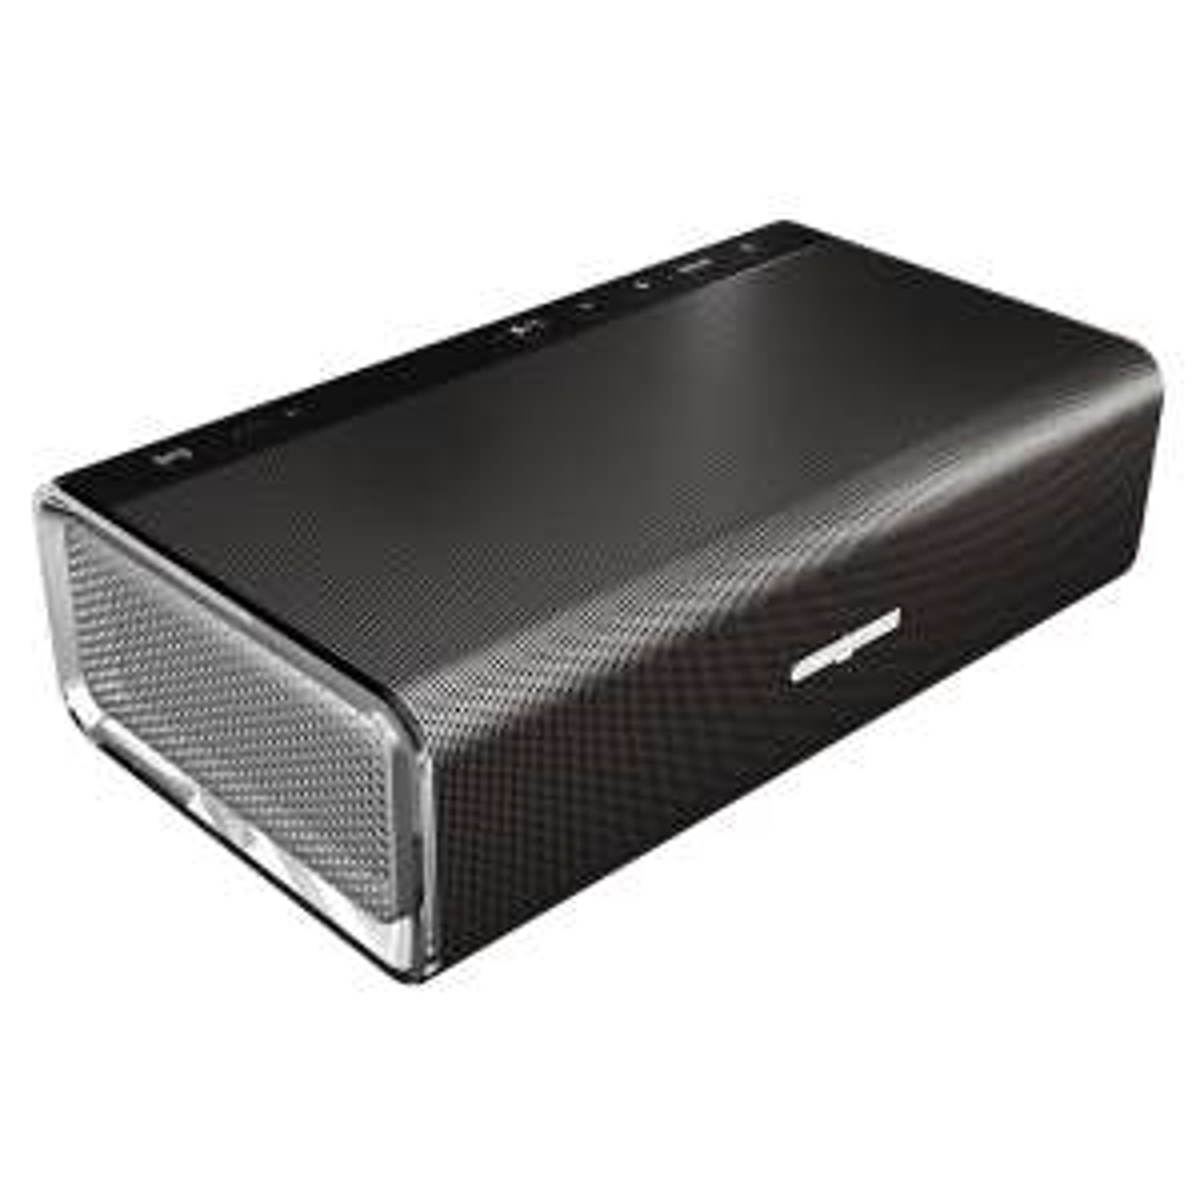 Enceinte Sans-fil Creative Sound Blaster Roar SR20 Bluetooth/NFC/Jack/MicroSD -  Carte Son Externe